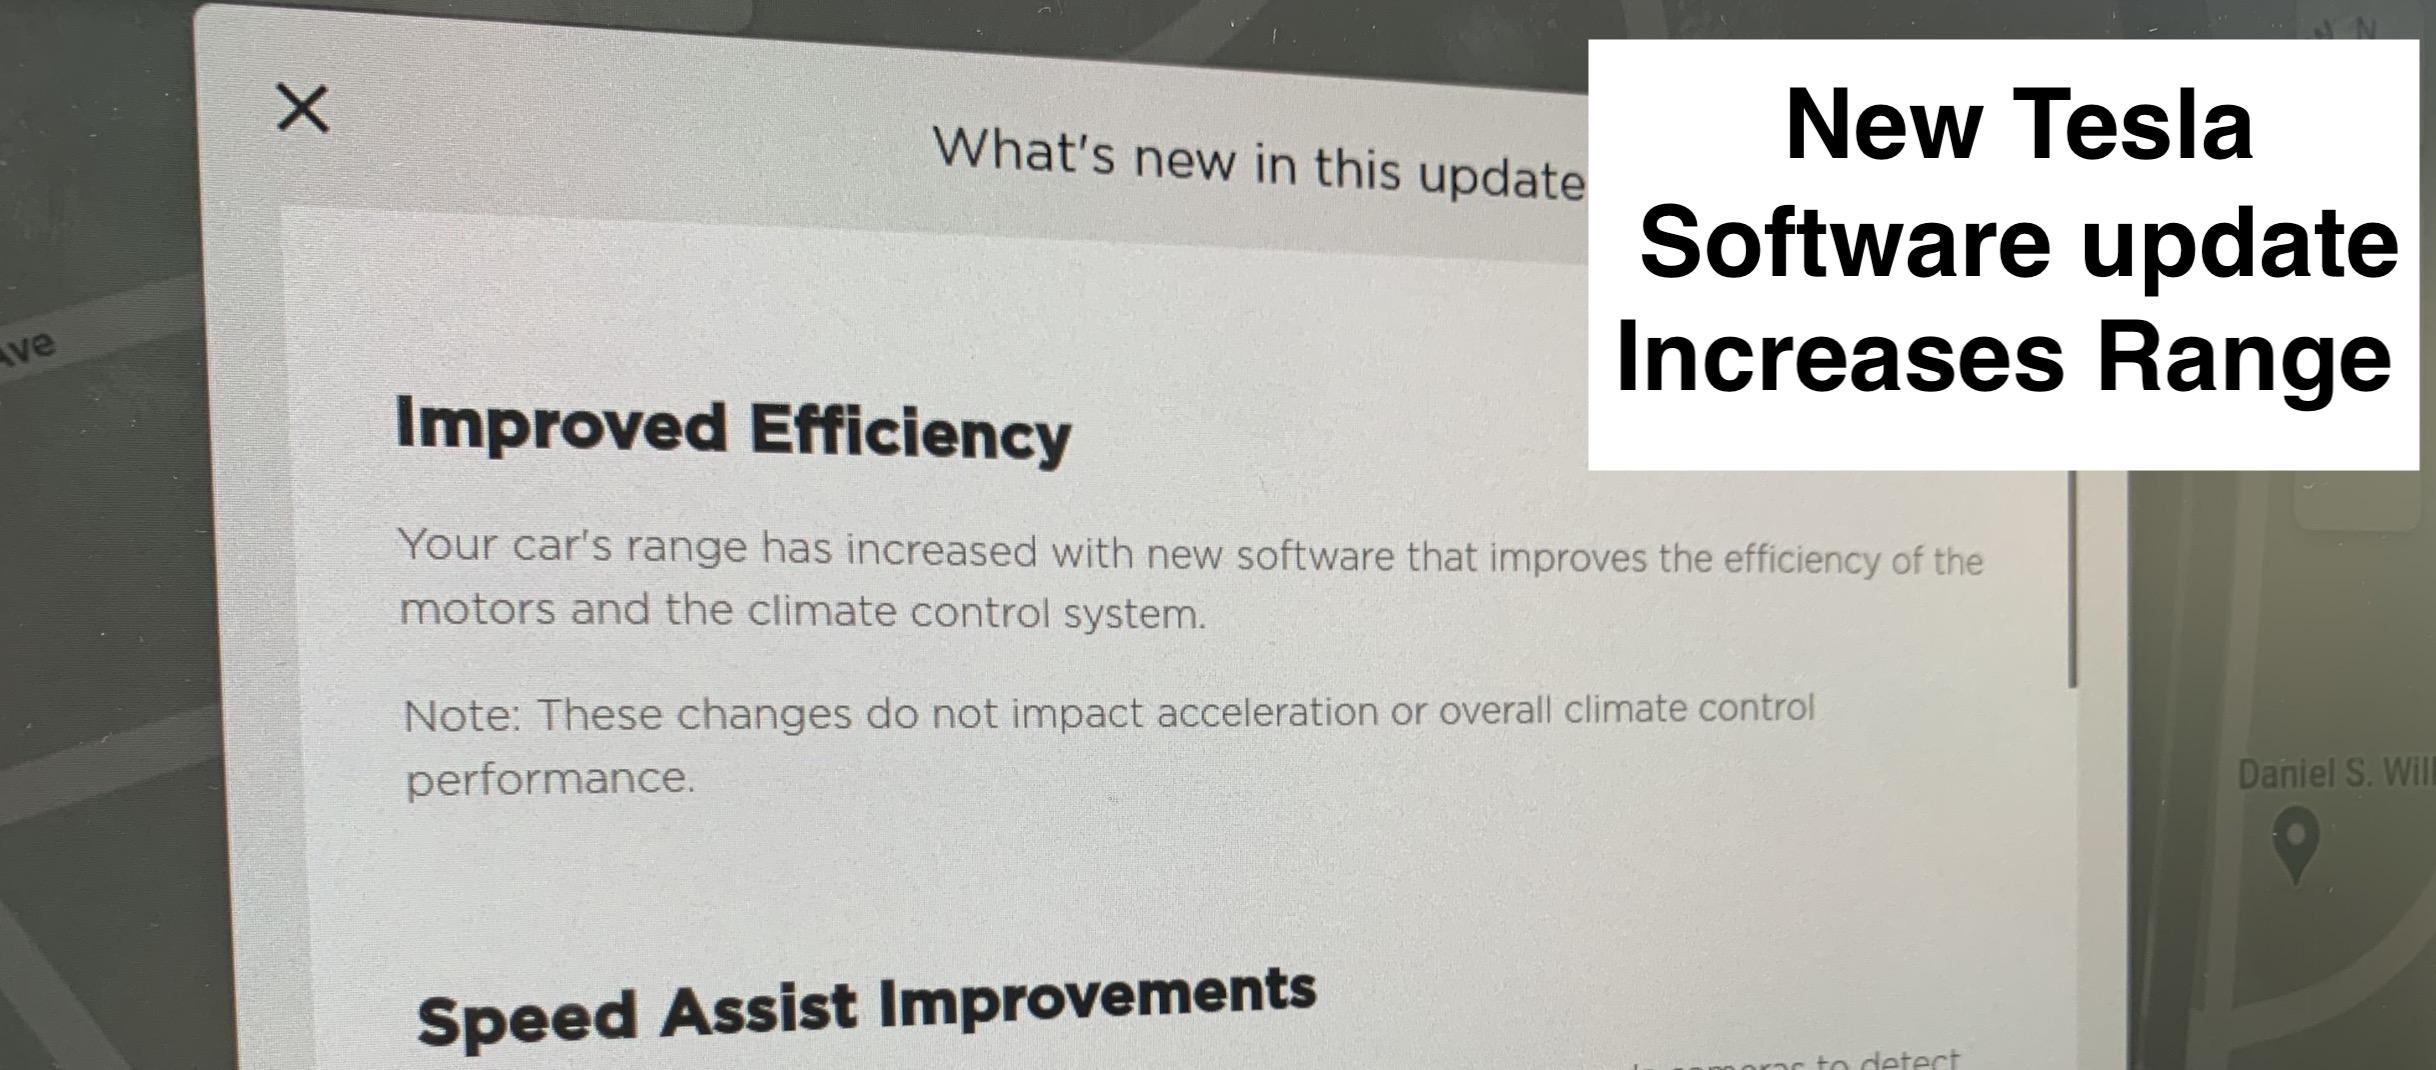 Tesla software update increases range jpg?quality=82&strip=all.'